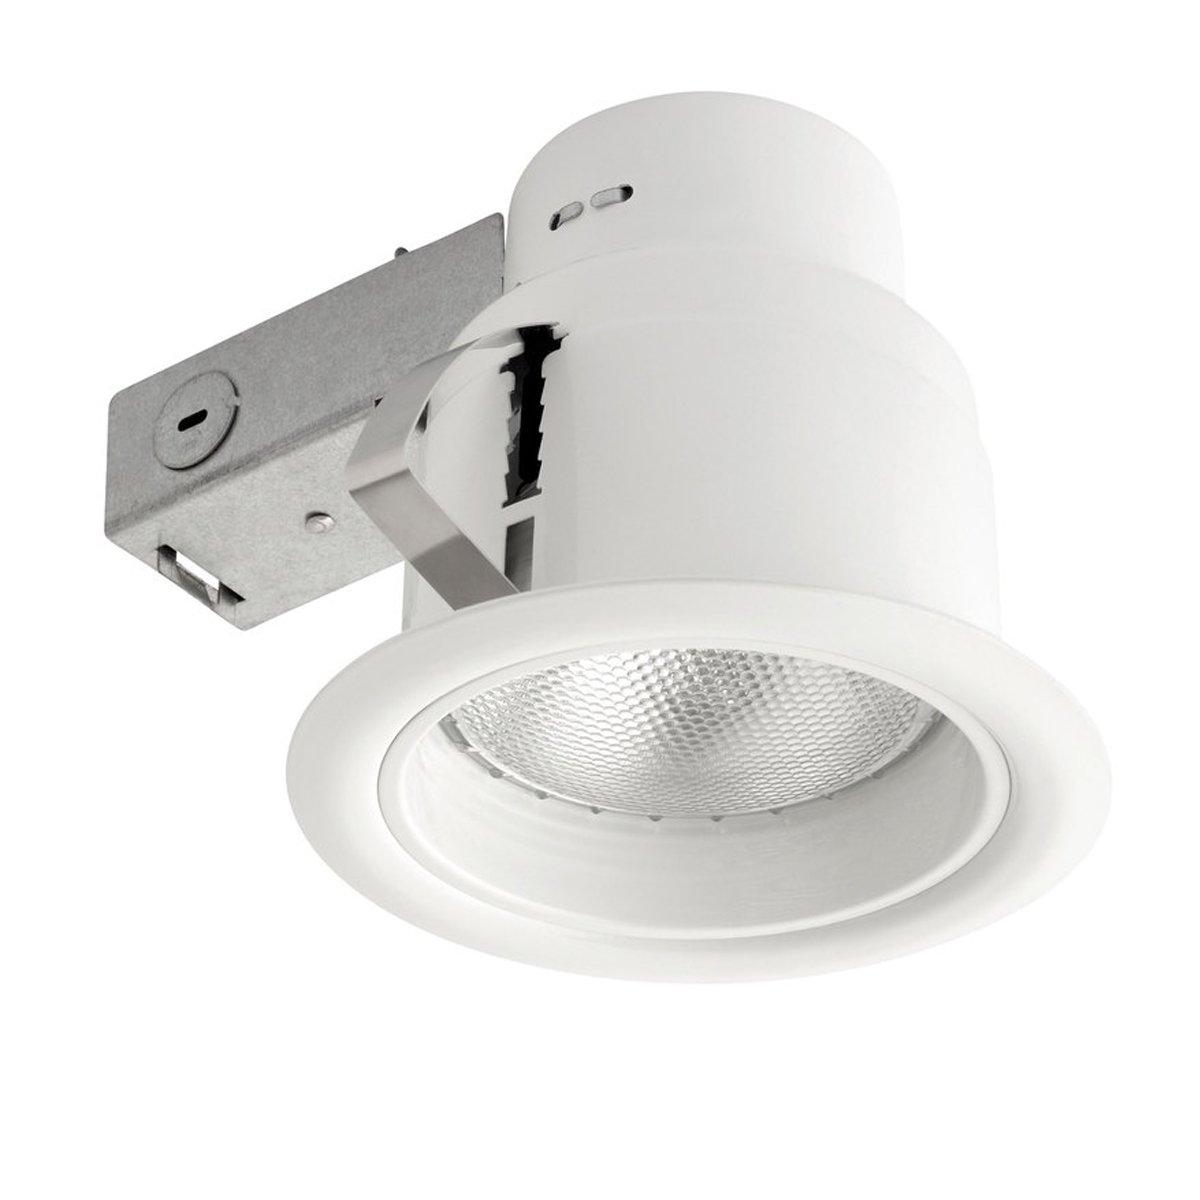 Globe Electric 9251201 5 inch Recessed Lighting Kit, White Finish with White Baffle, Flood Light